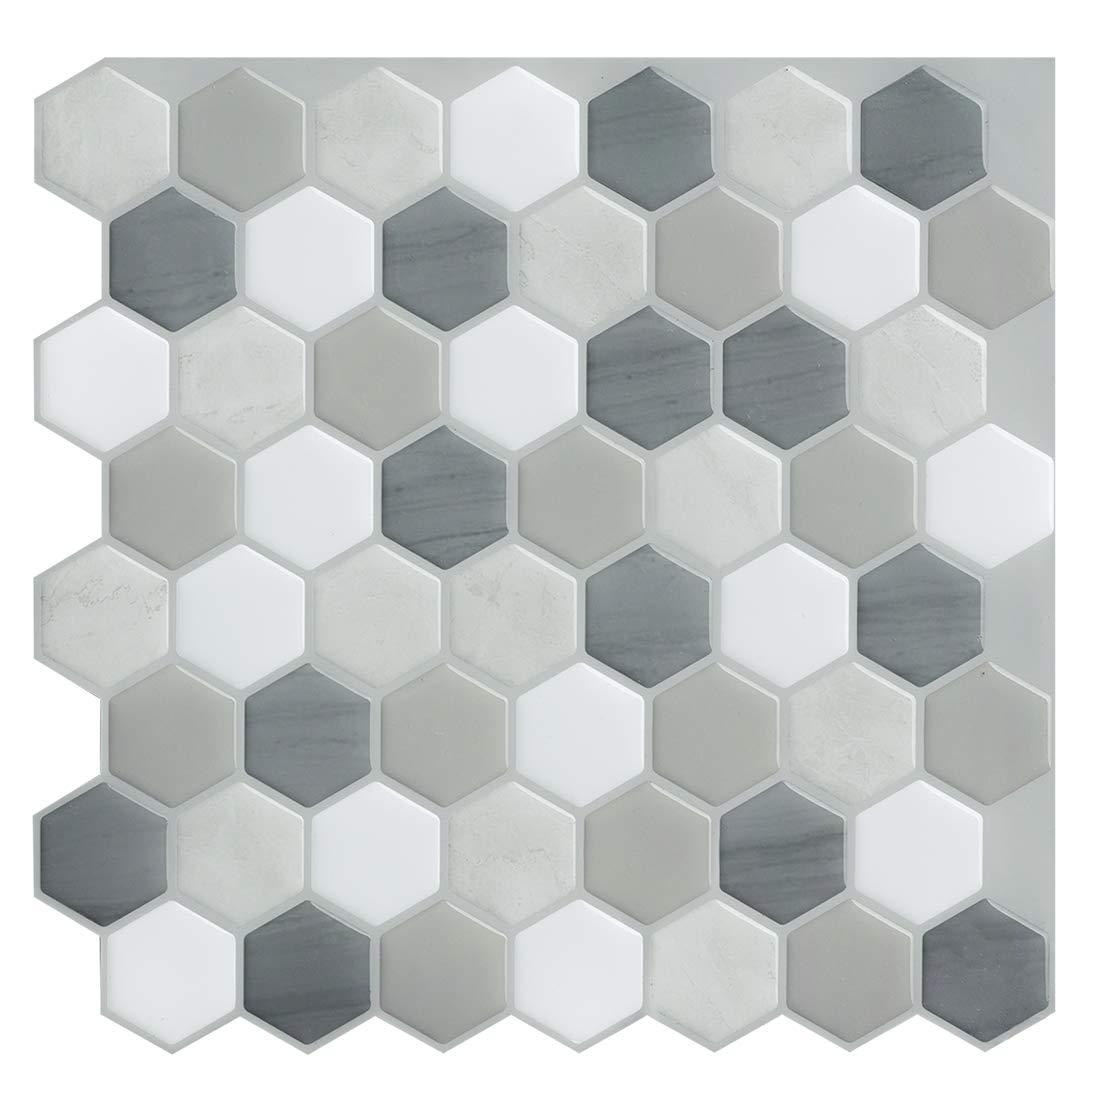 Remarkable Self-Adhesive Backsplash 9 x 9,4Sheets Premium Peel and Stick Wall Tile for Kitchen,Black Decorative Tile Stickers